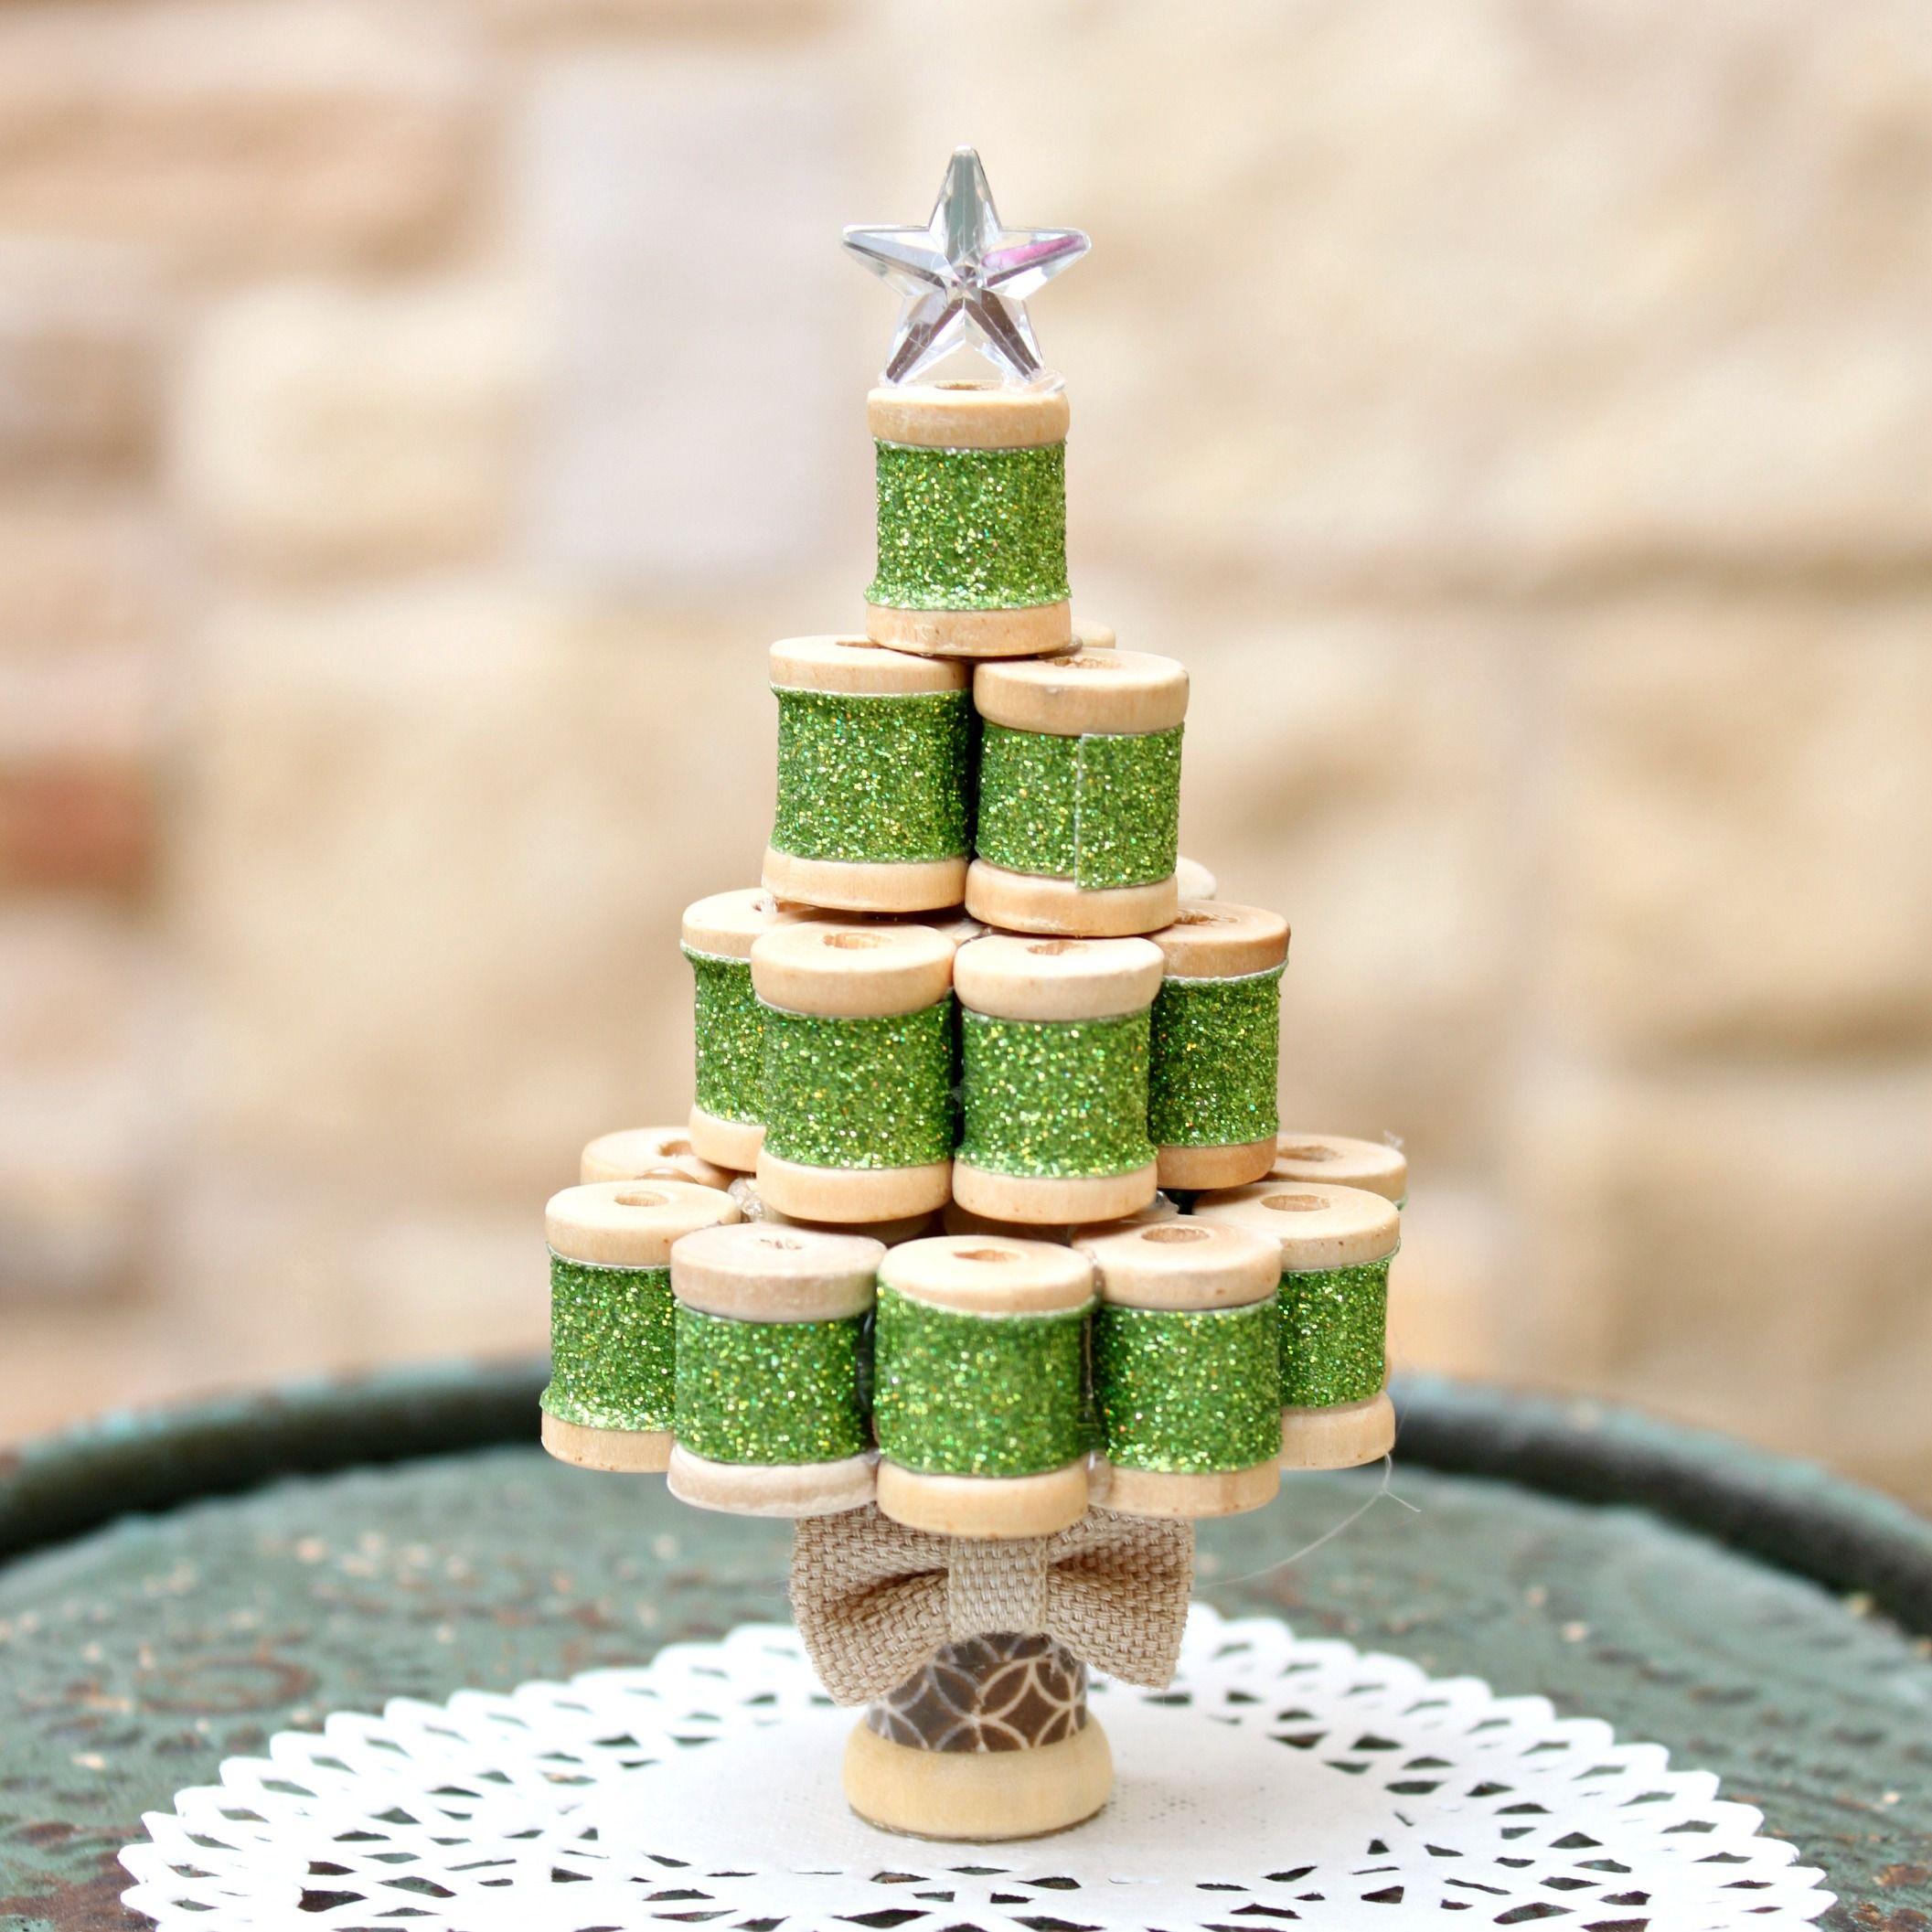 Thread Christmas Tree: Spool Christmas Tree Ornament